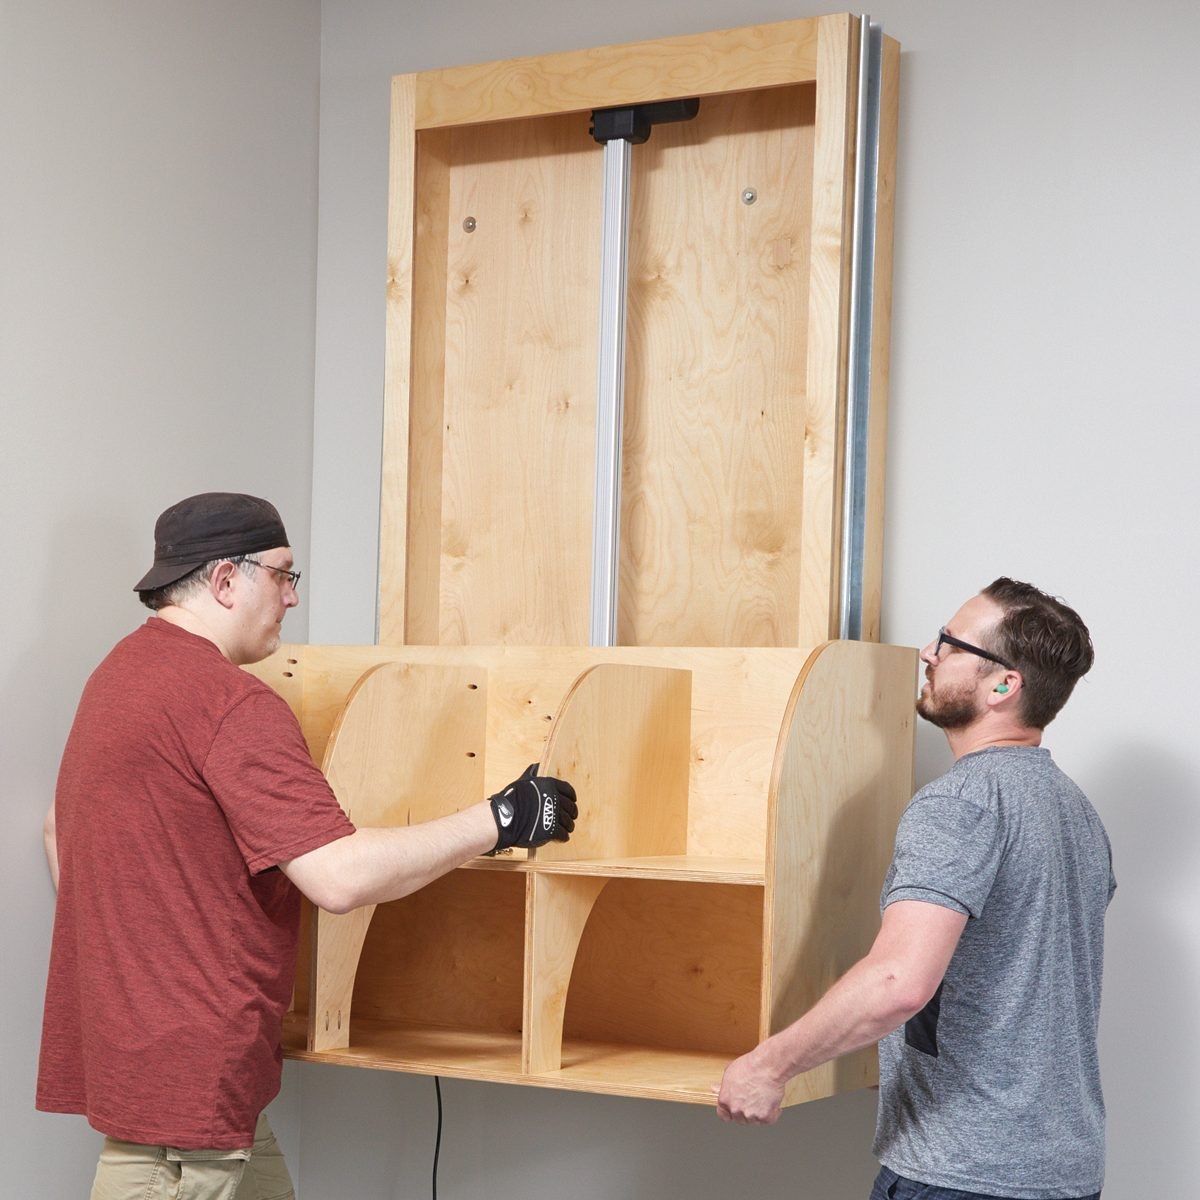 Setting the shelf